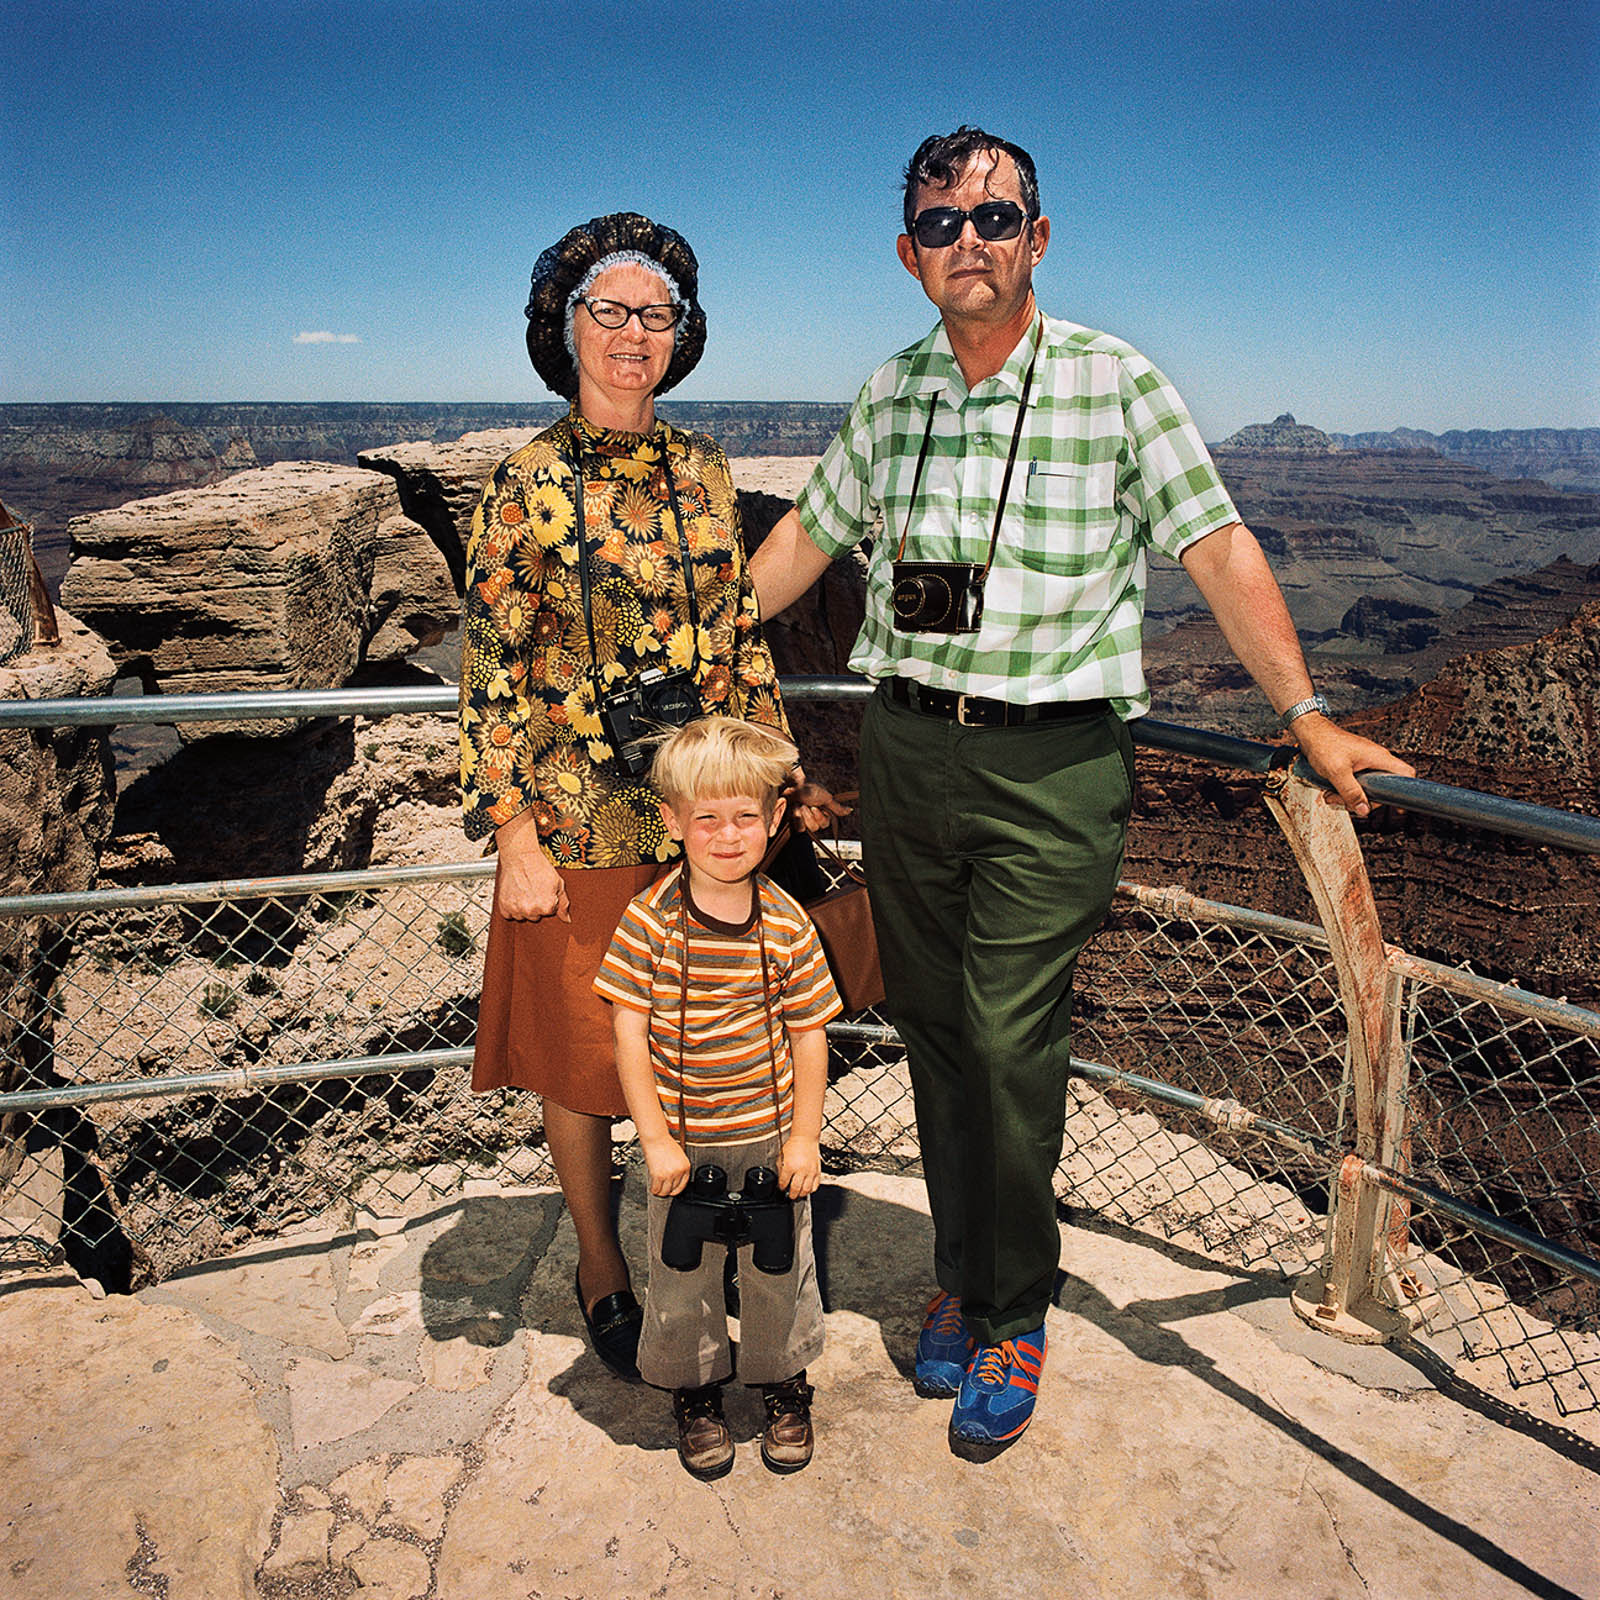 Family Wearing Earth Colors, Grand Canyon National Park, Arizona 1980